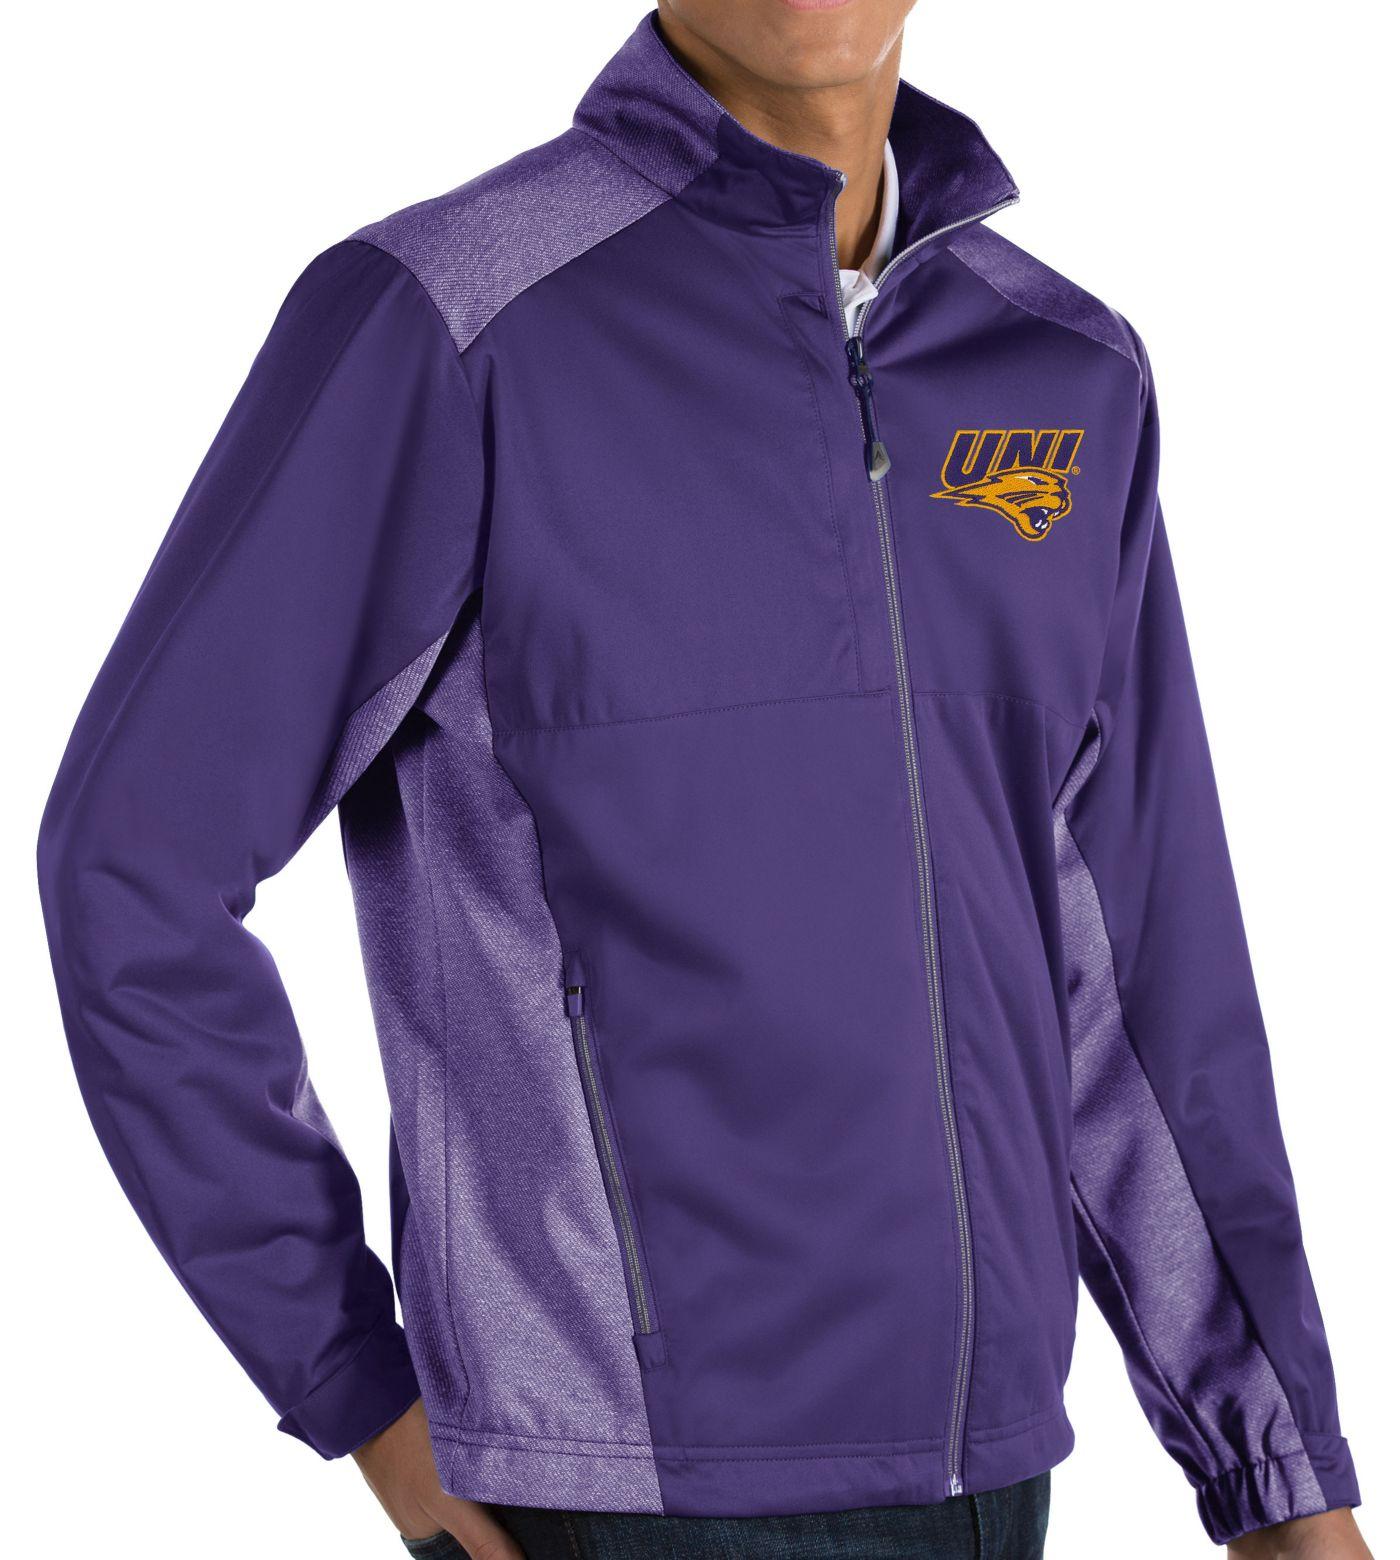 Antigua Men's Northern Iowa Panthers  Purple Revolve Full-Zip Jacket